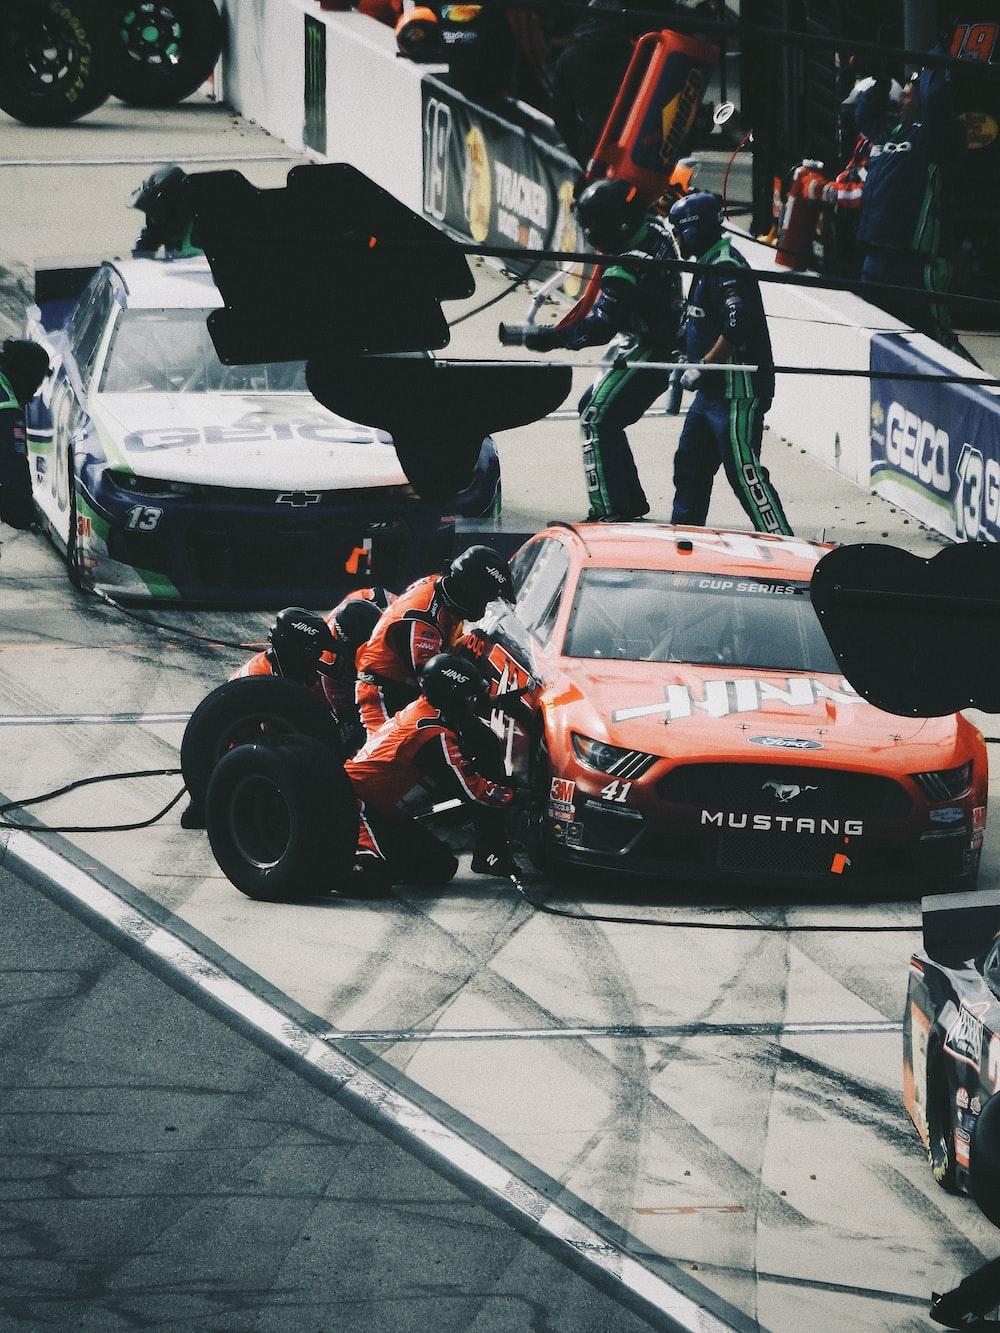 man in black jacket and pants riding orange and black racing car